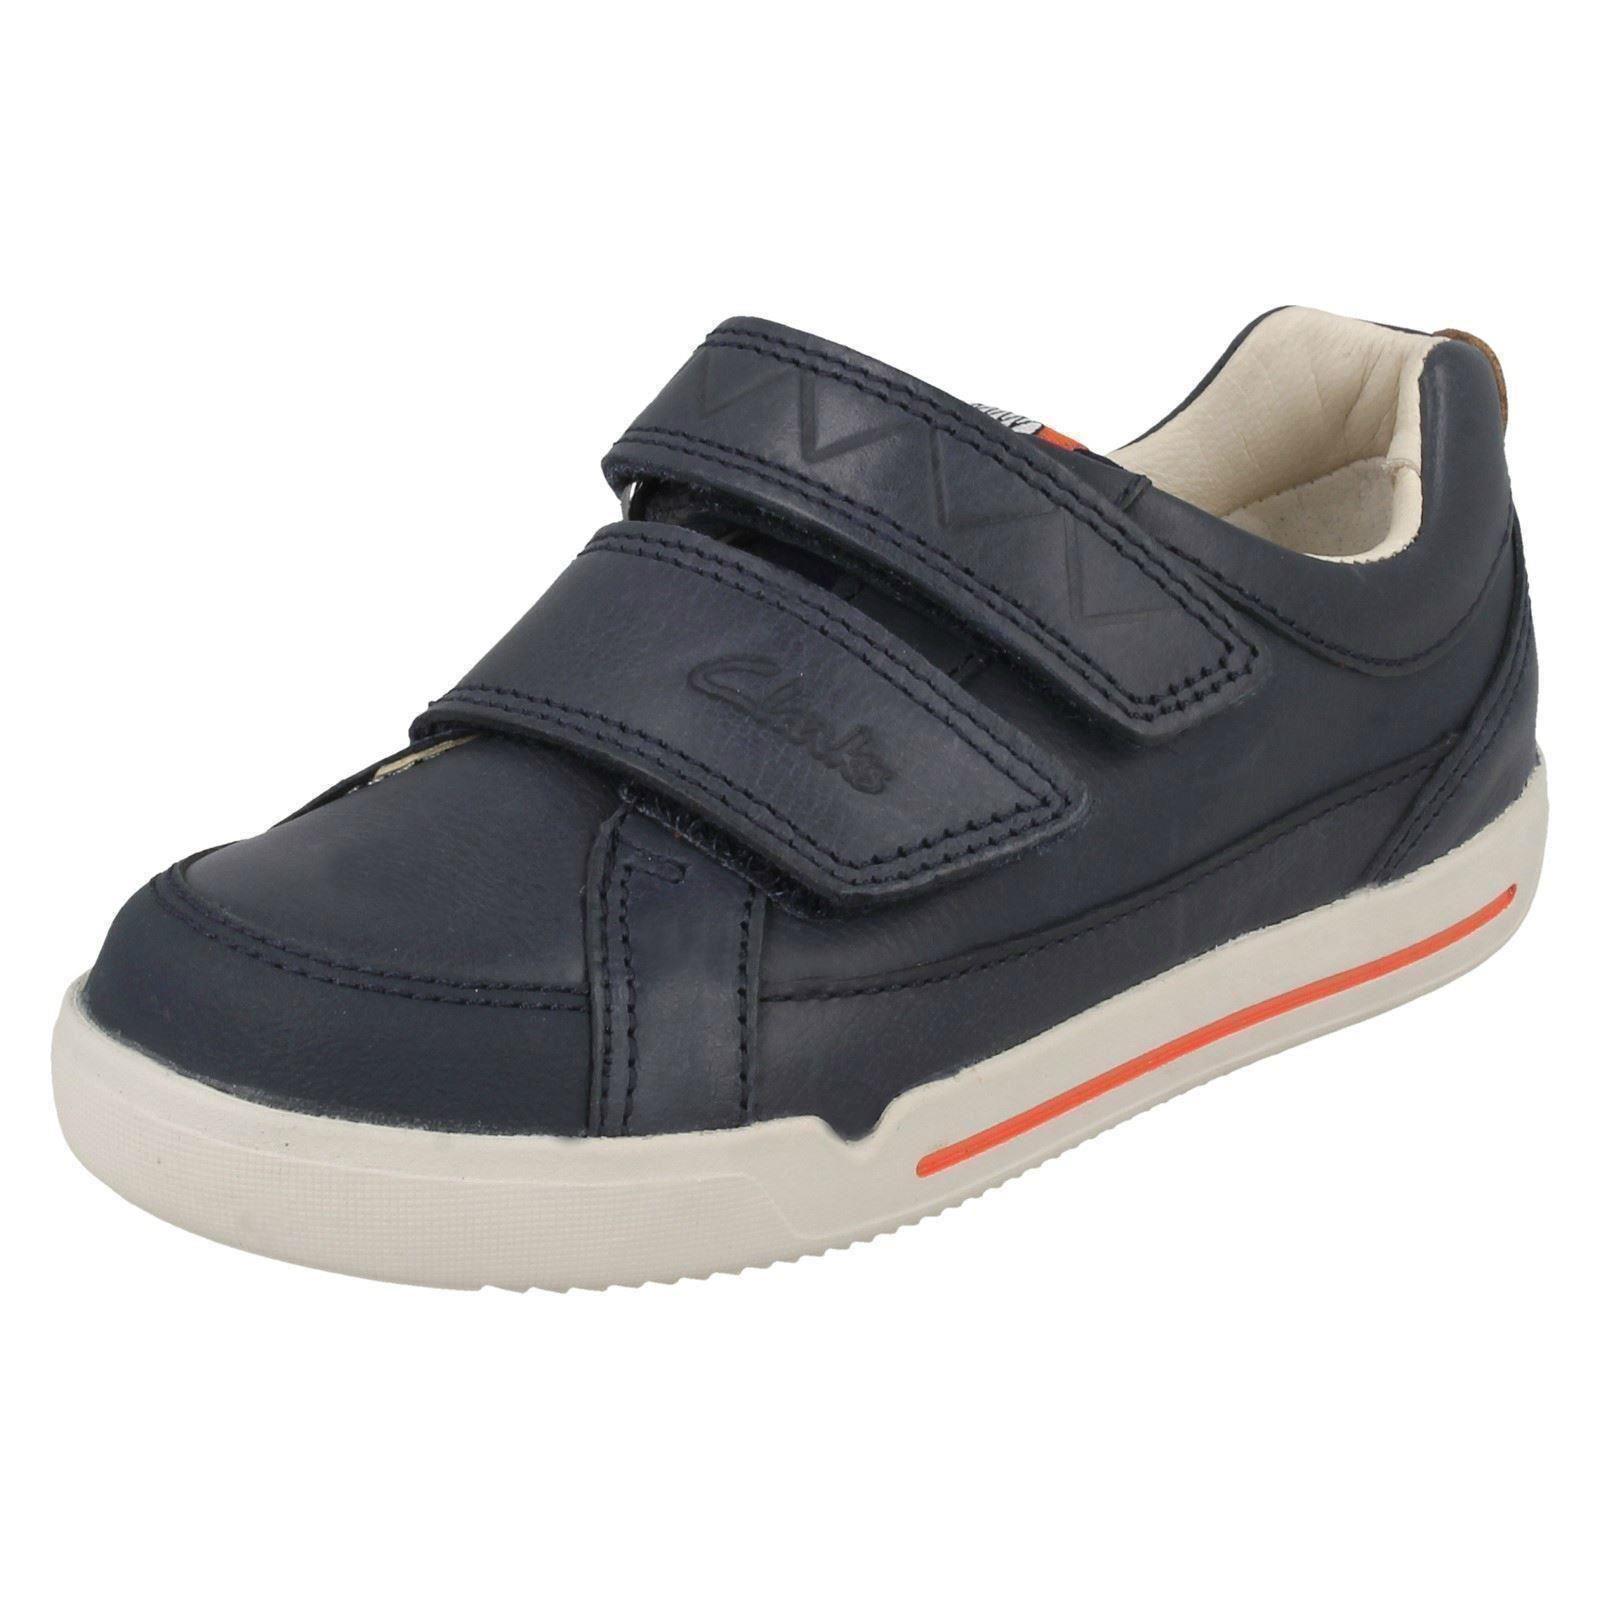 Chicos Clarks Zapatos Informales Correa Doble * Lil Folk Toby *